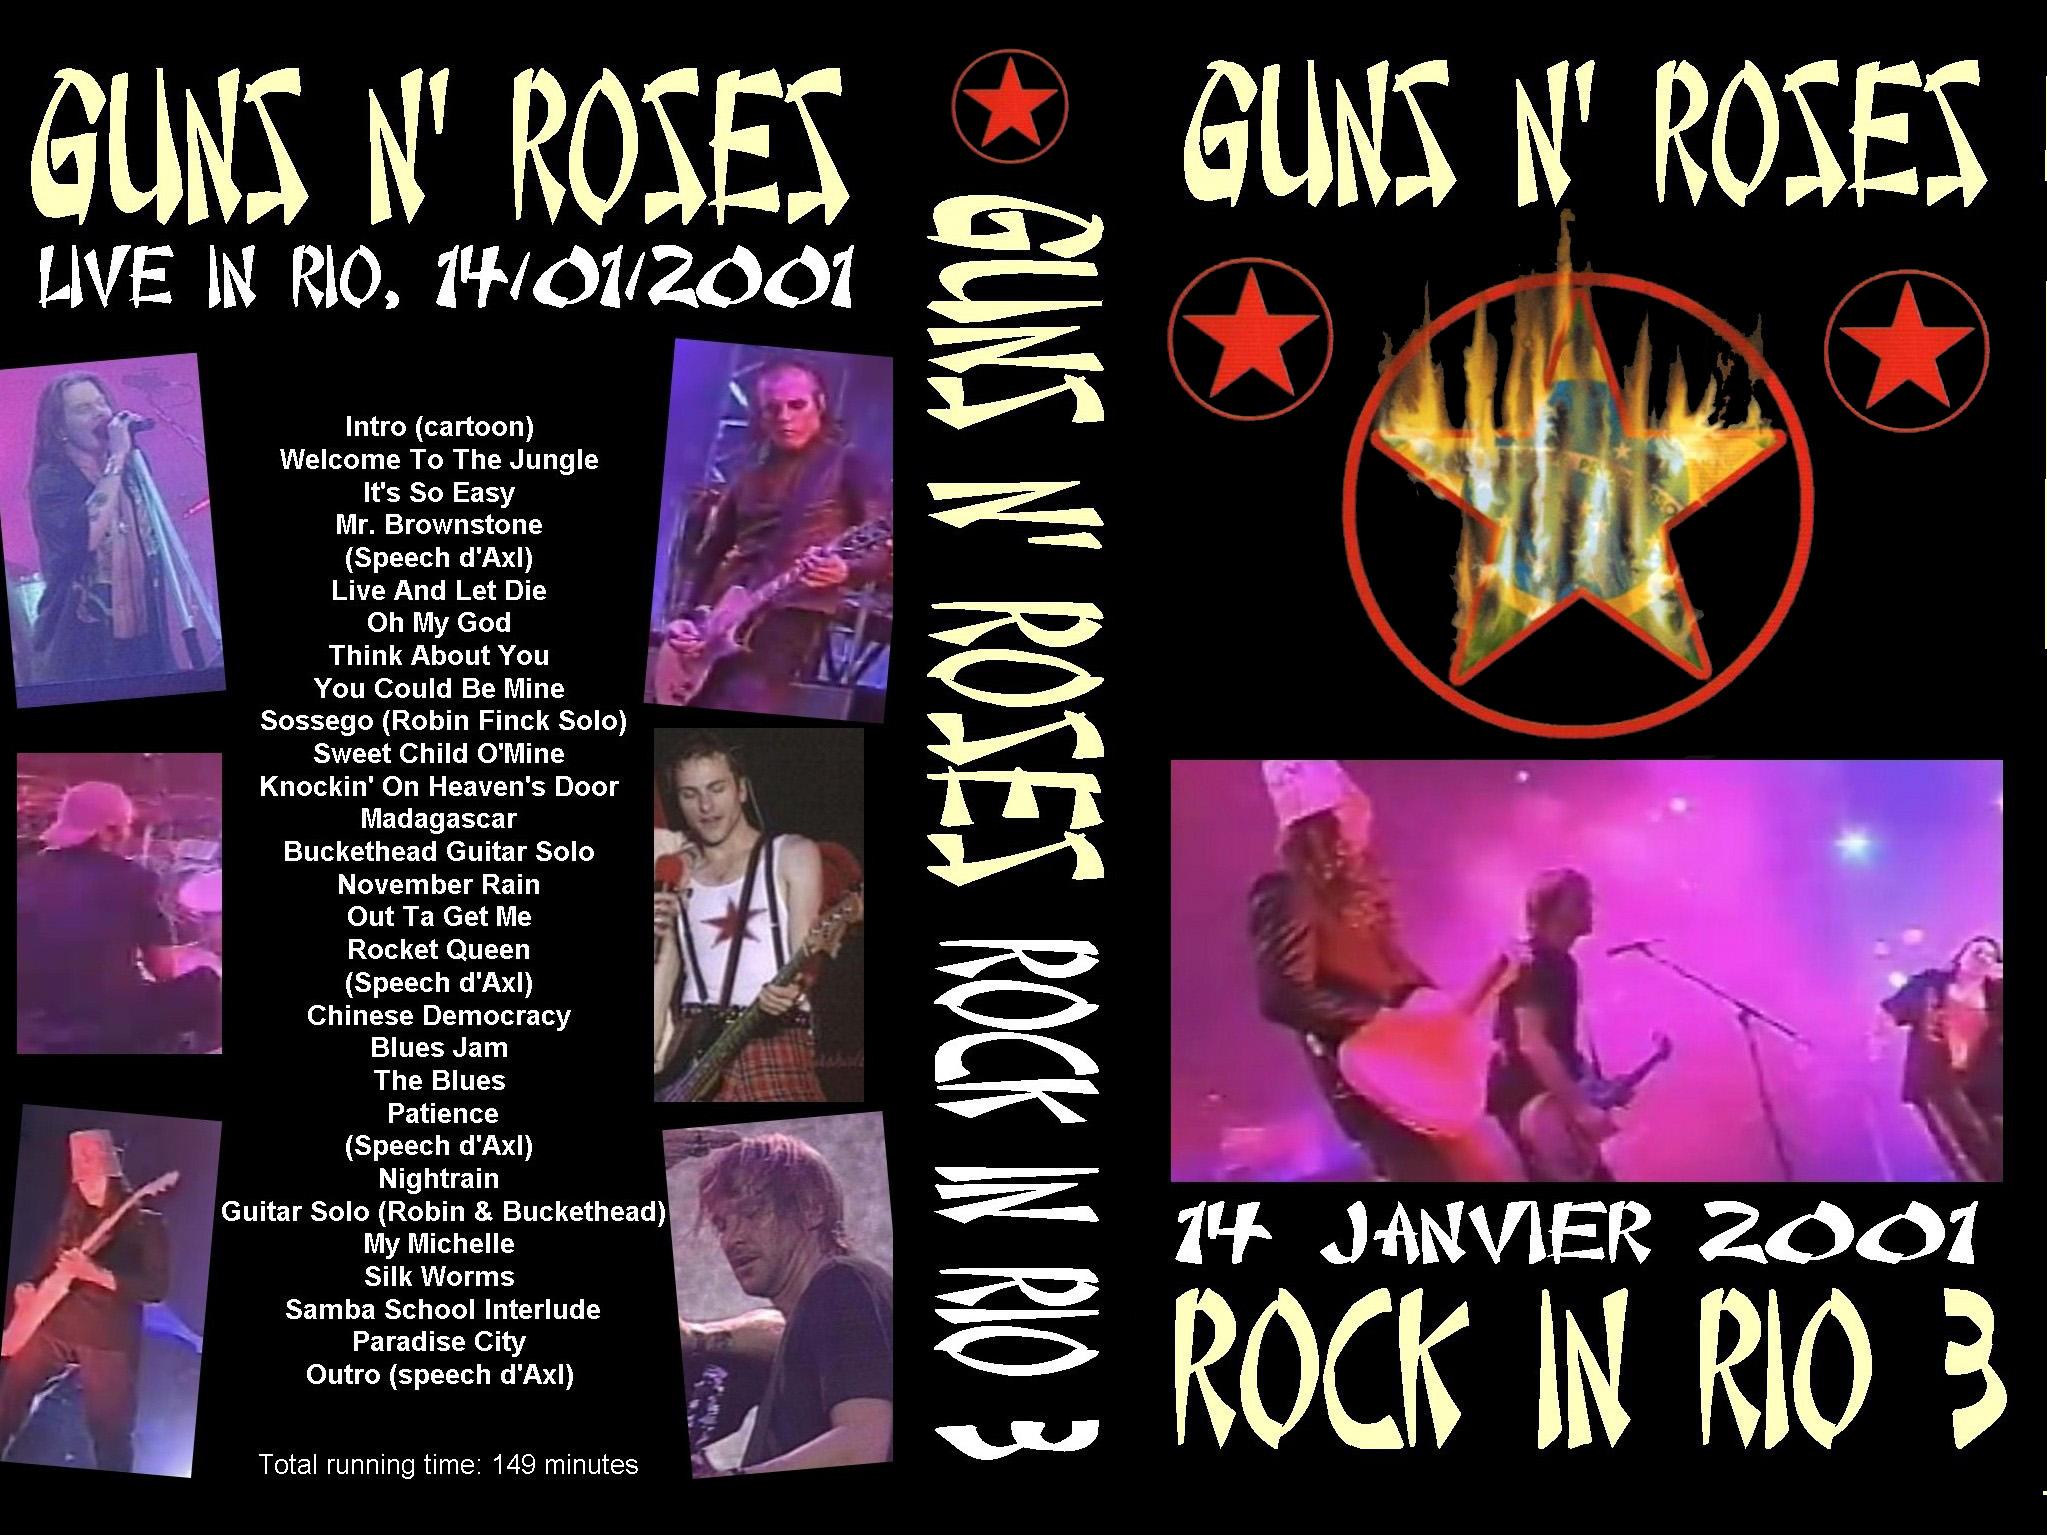 [DVD] Guns N' Roses - Rock In Río 2001 [MEGA] [MI-SUBIDA] 2001-01-15%20Rio3%20(SA)